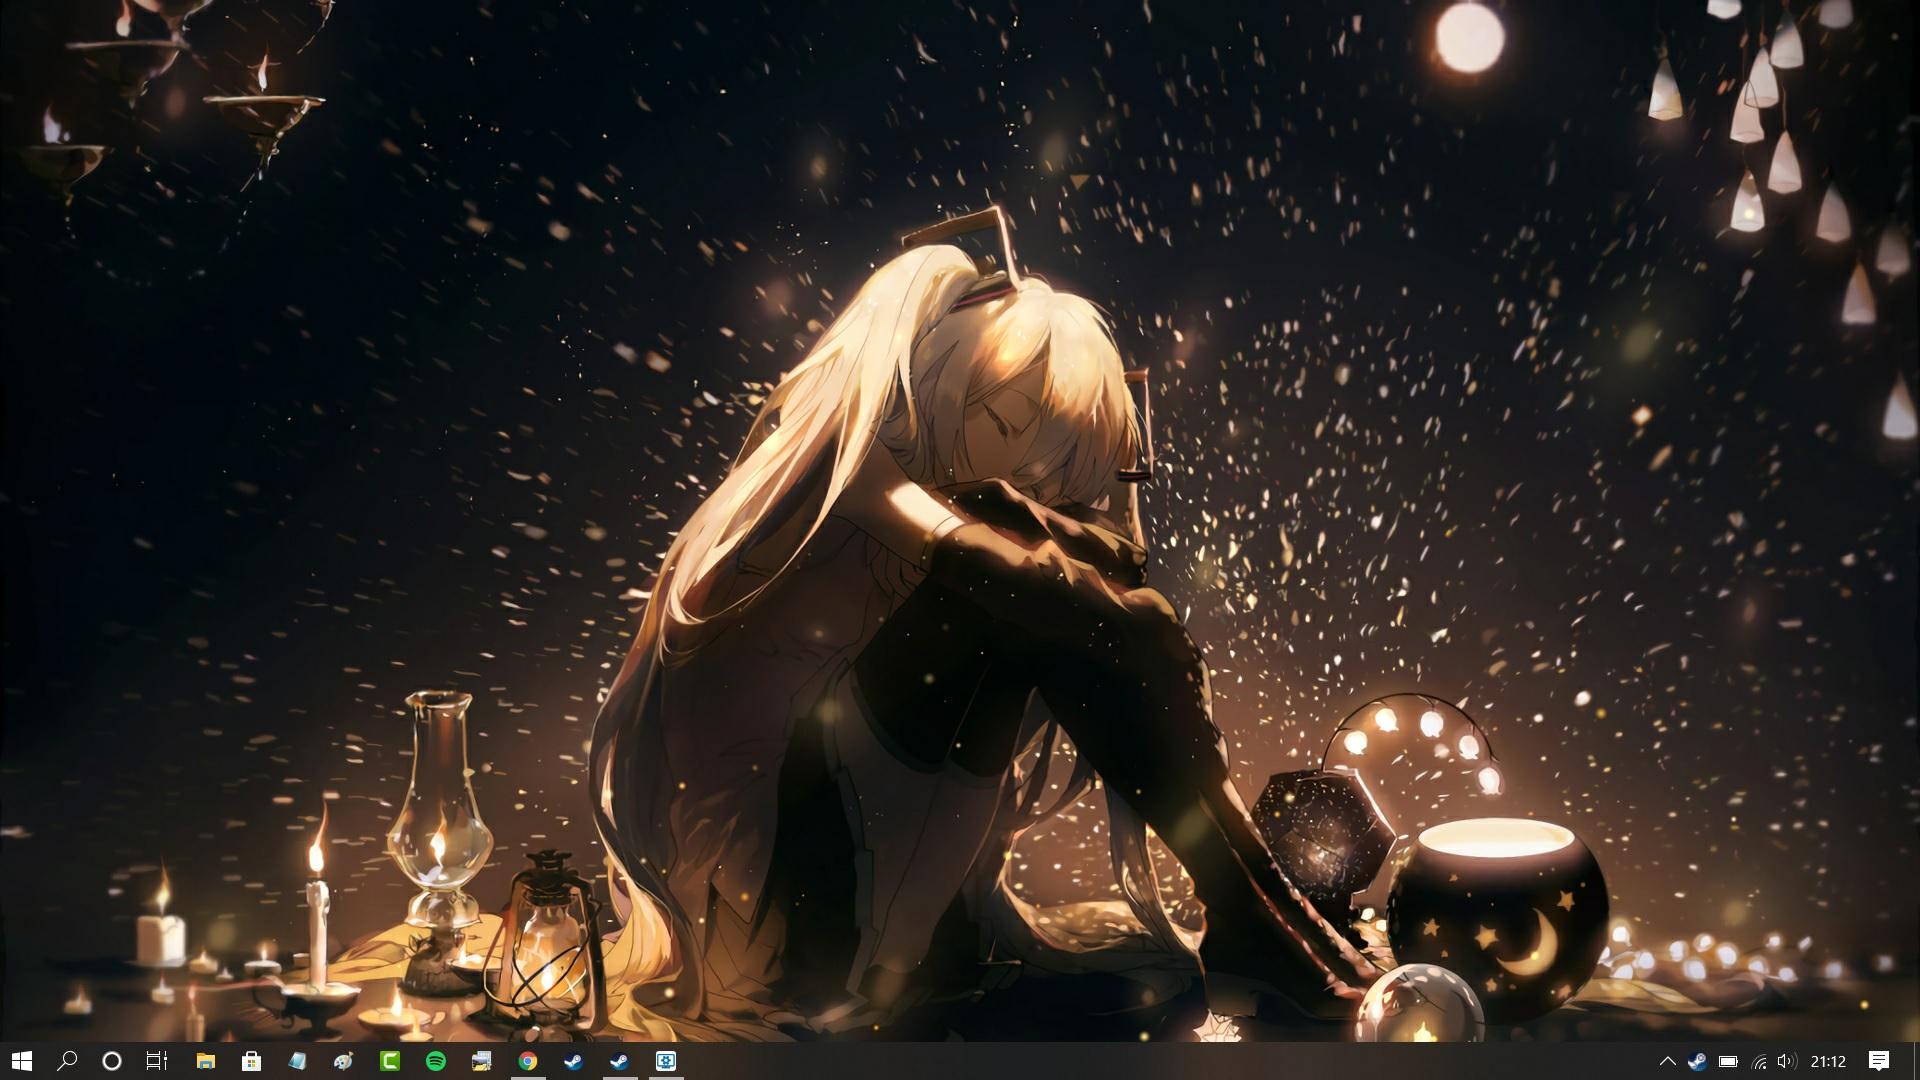 Hatsune Miku Vocaloid Live Wallpaper